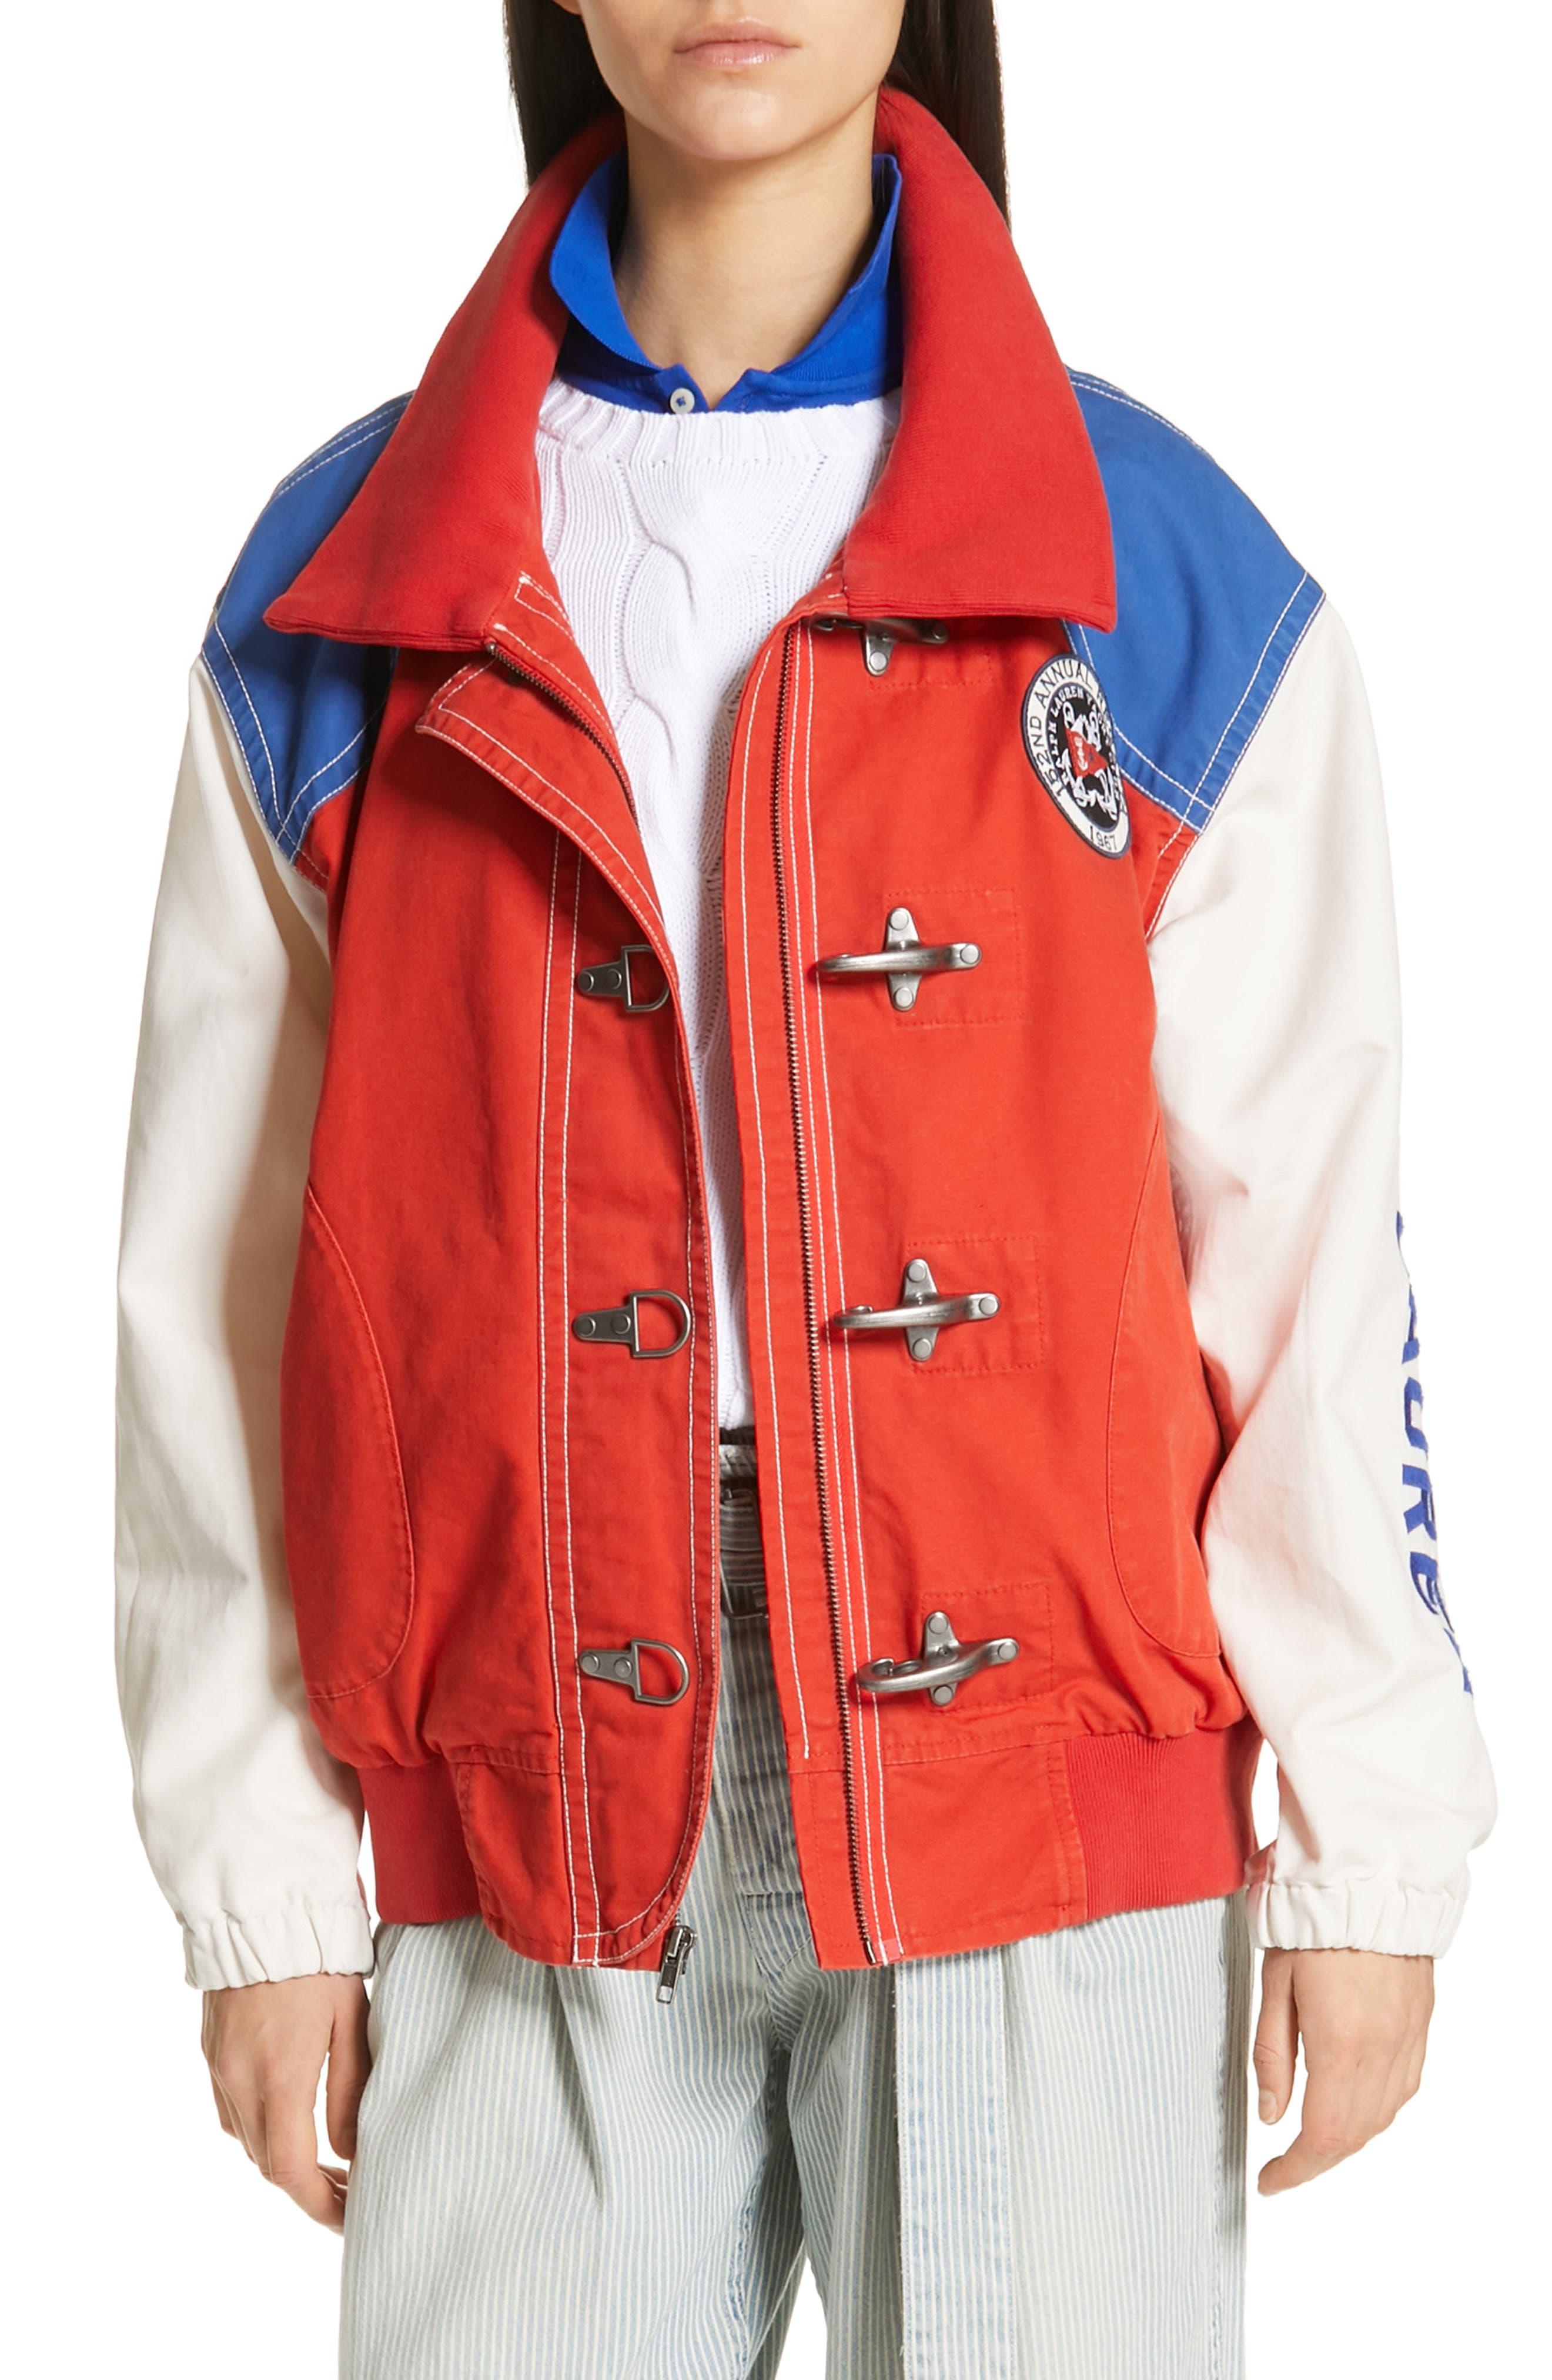 POLO RALPH LAUREN Colorblock Utility Jacket, Main, color, ORANGE/CREAM/ SAPPHIRE